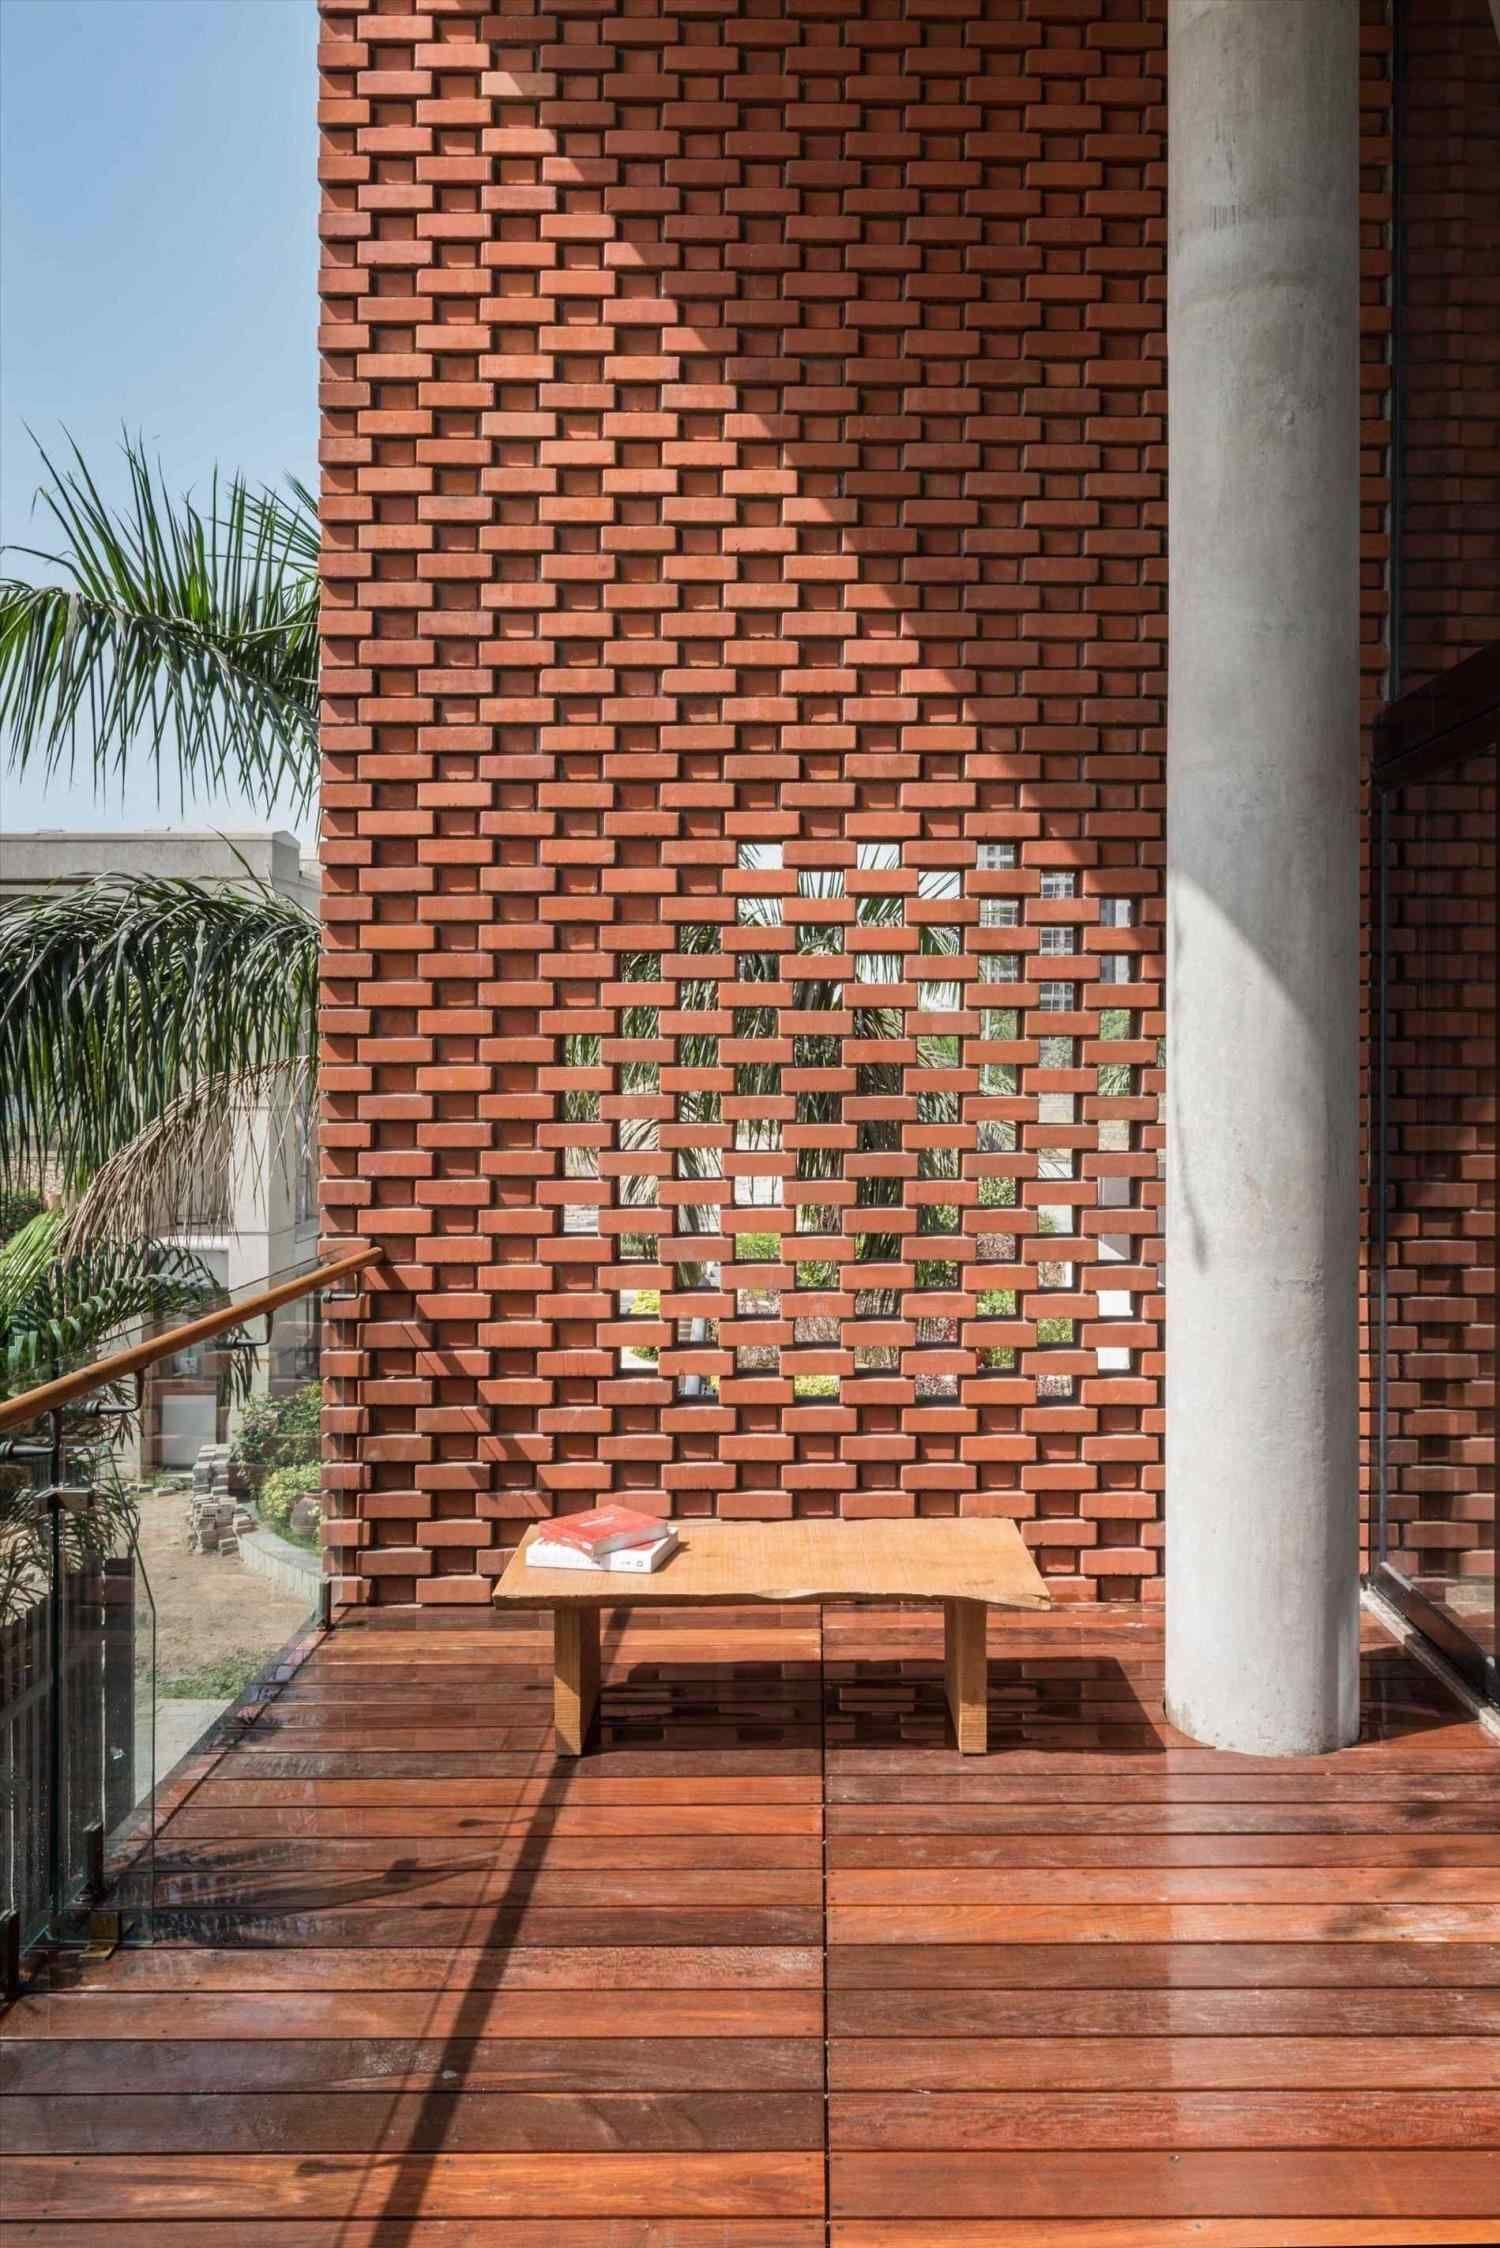 Incredible 14 Exterior Screen Wall To Inspire You